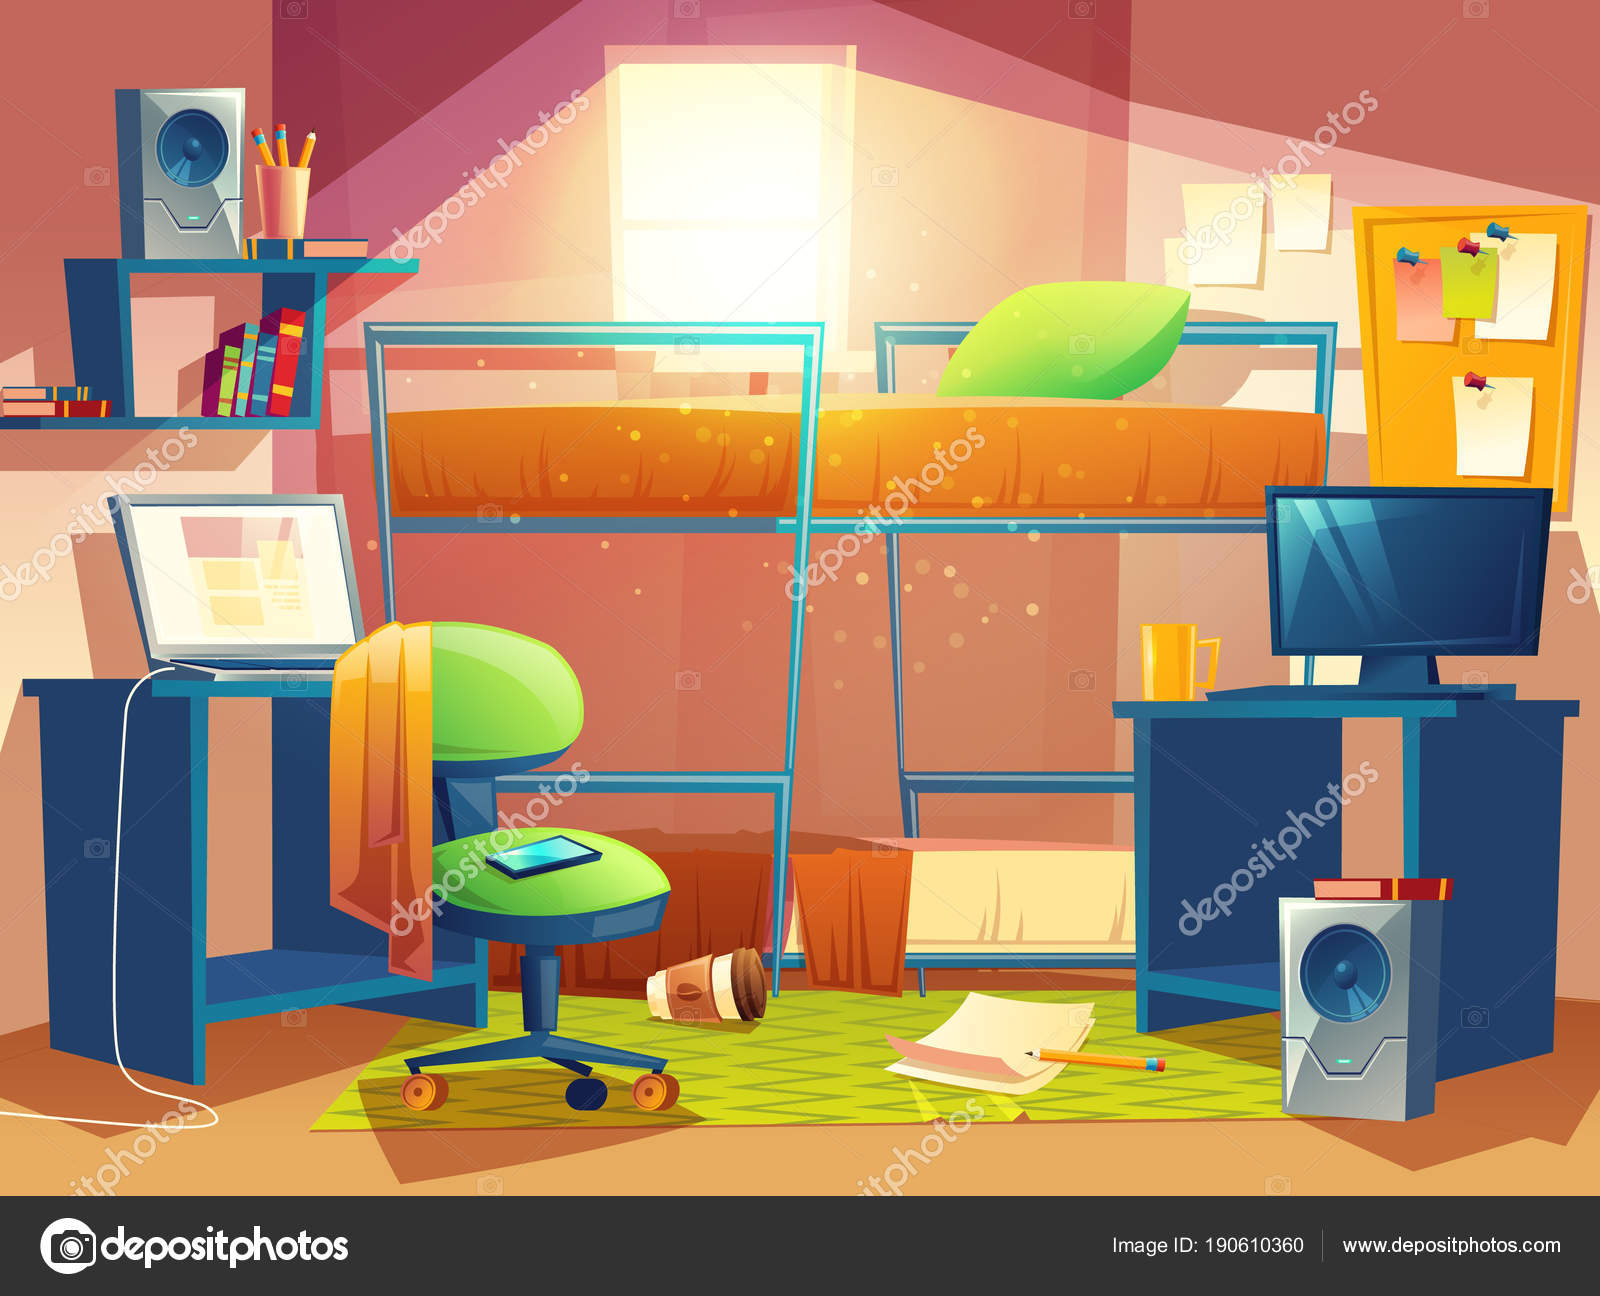 Ilustra o vetor dos desenhos animados pequeno dormit rio for Dormitorio animado